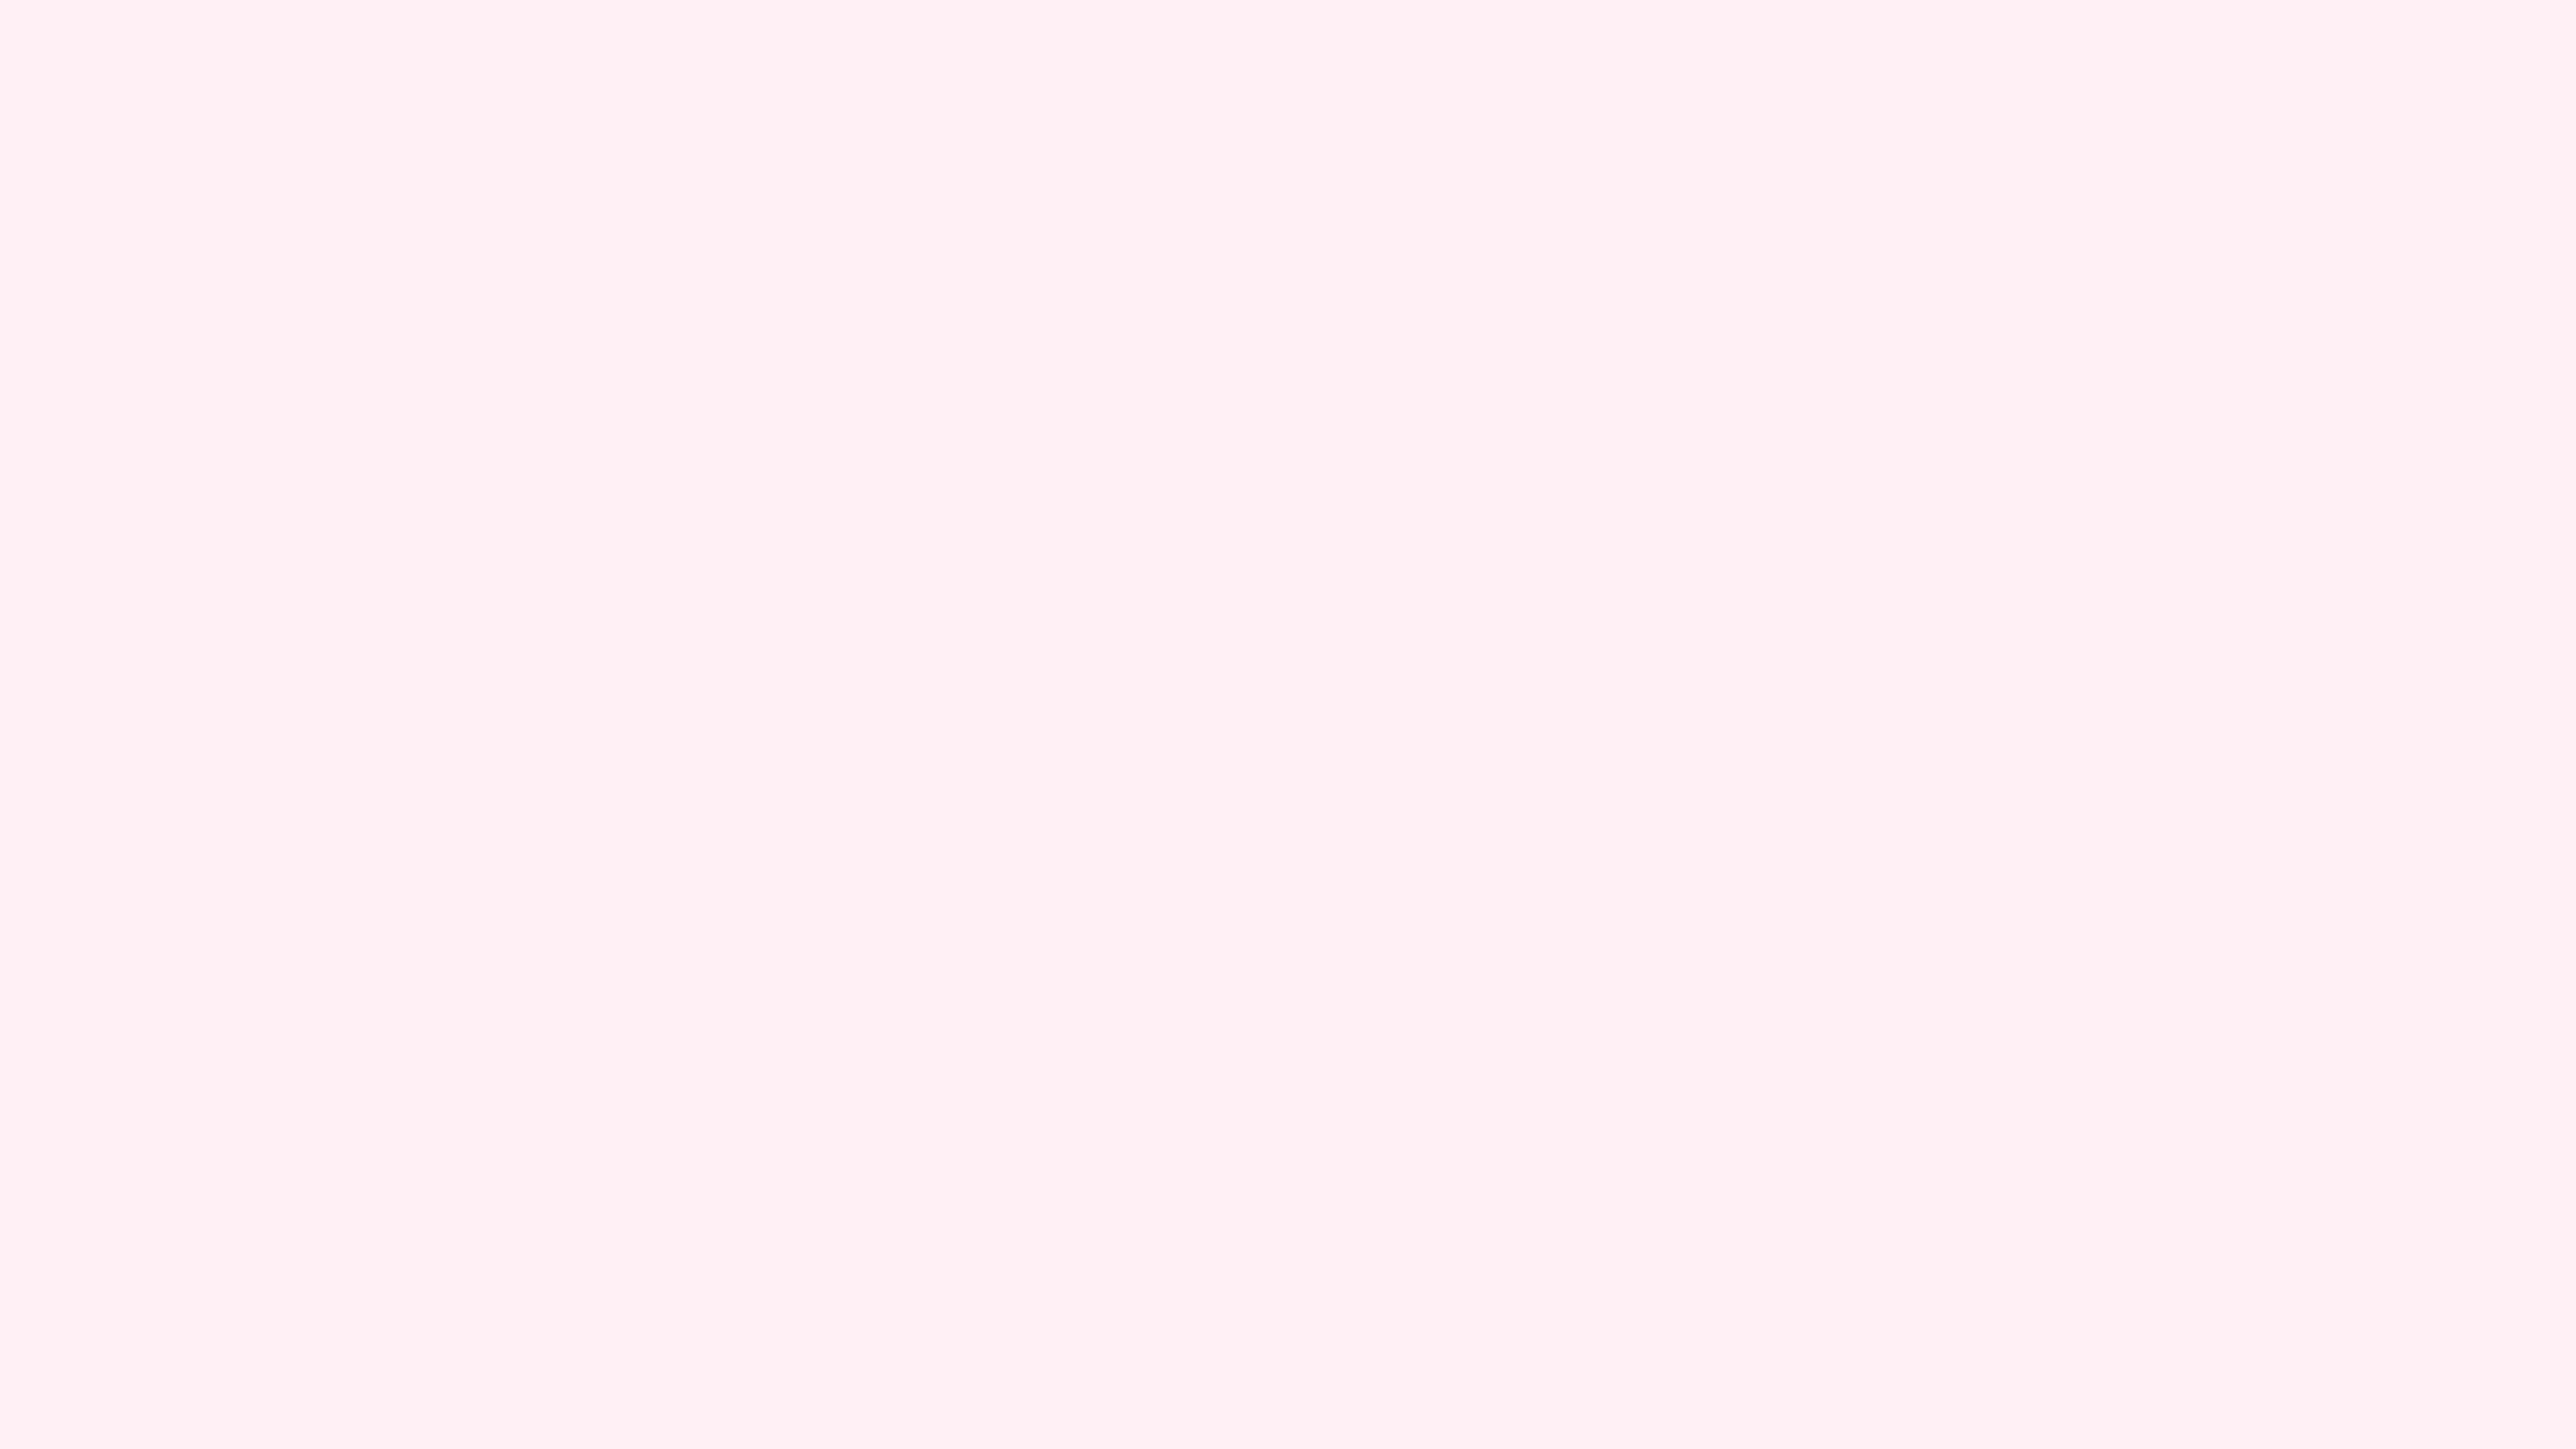 4096x2304 Lavender Blush Solid Color Background